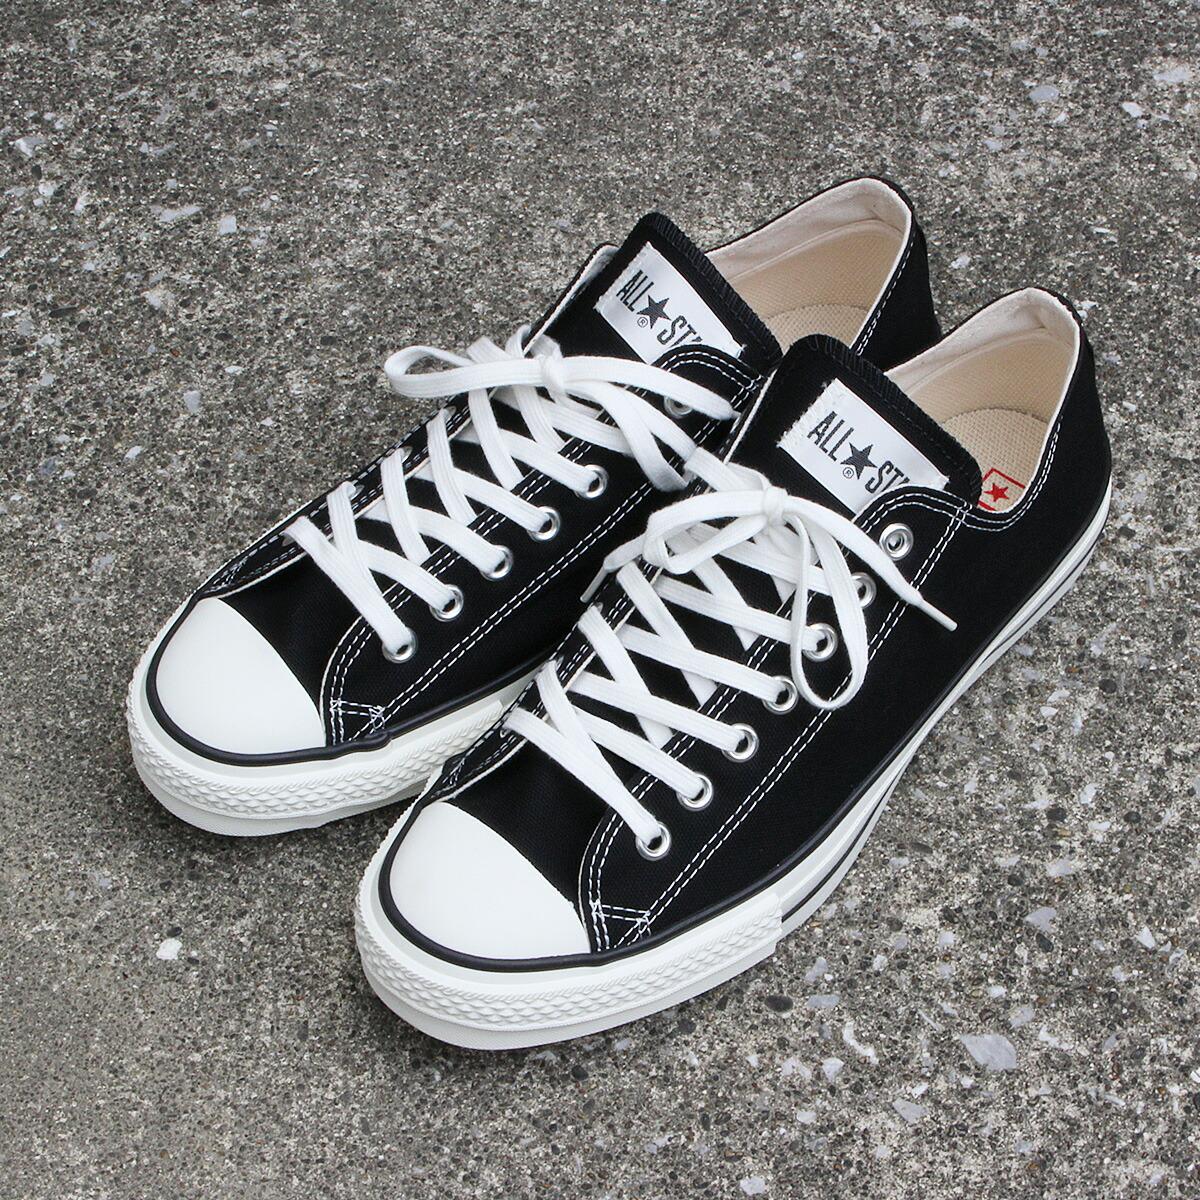 converse all star on feet